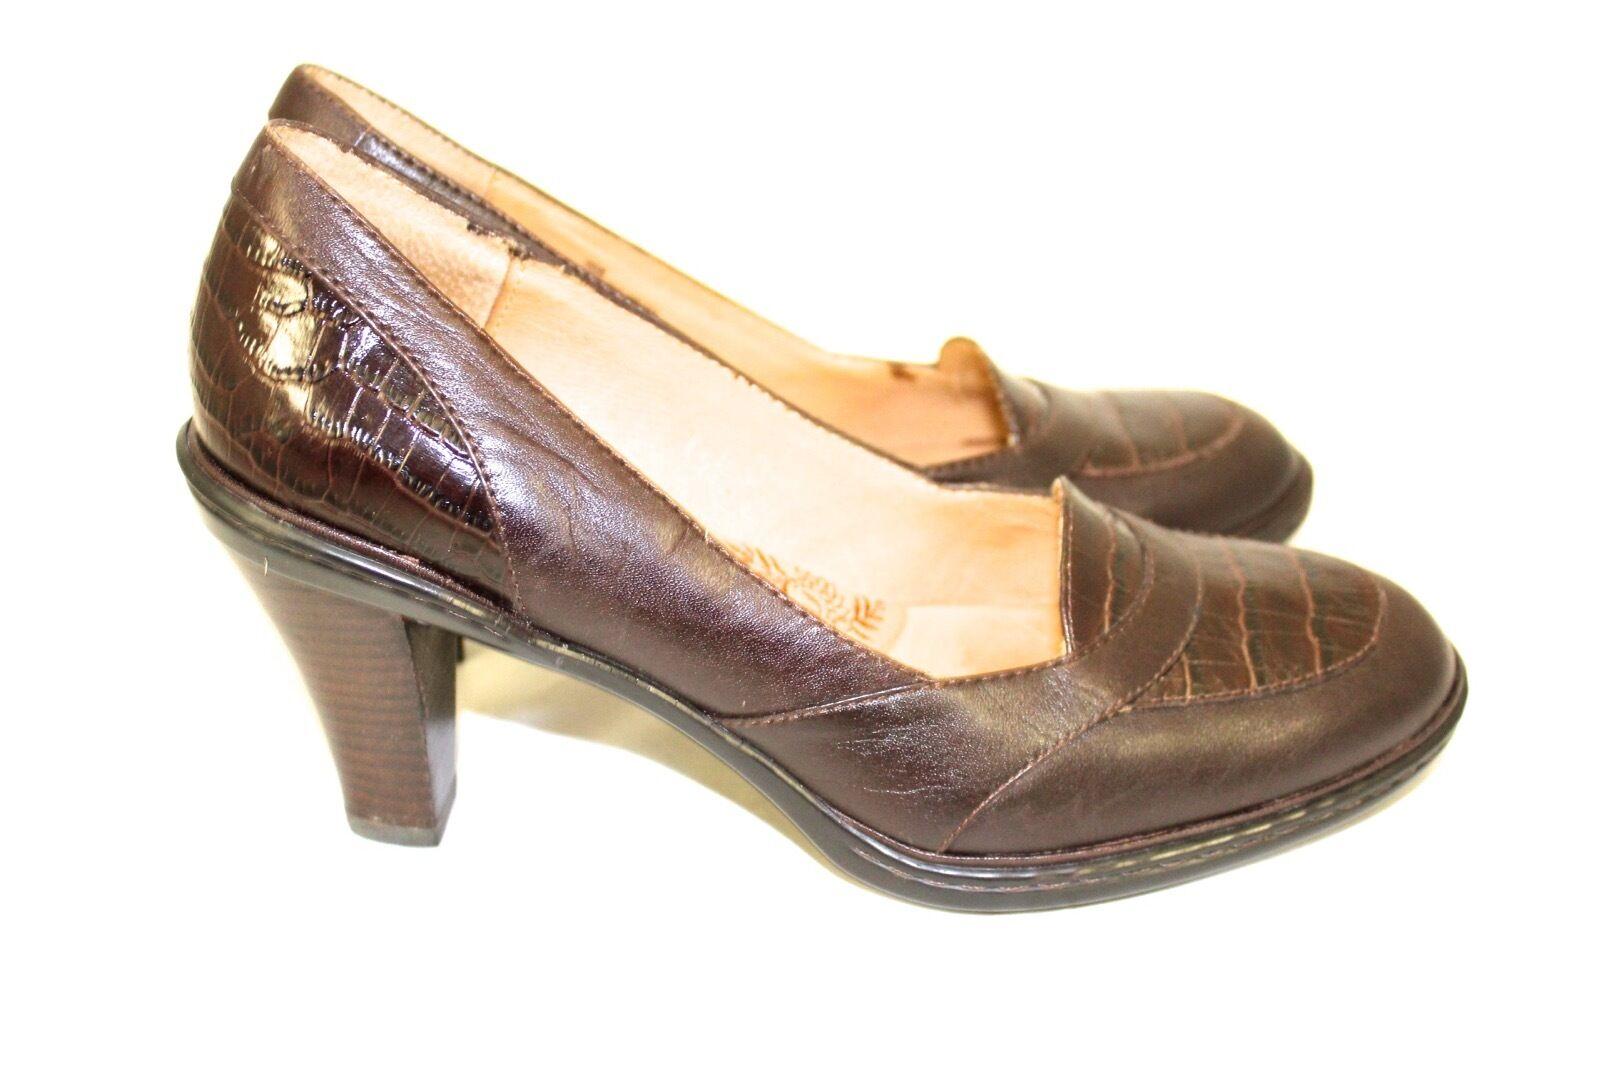 marchi di moda SOFFT Marrone Leather & Croc Pattern 3.5 3.5 3.5  Heel Rounded Toe Pumps  9M NEW  fabbrica diretta